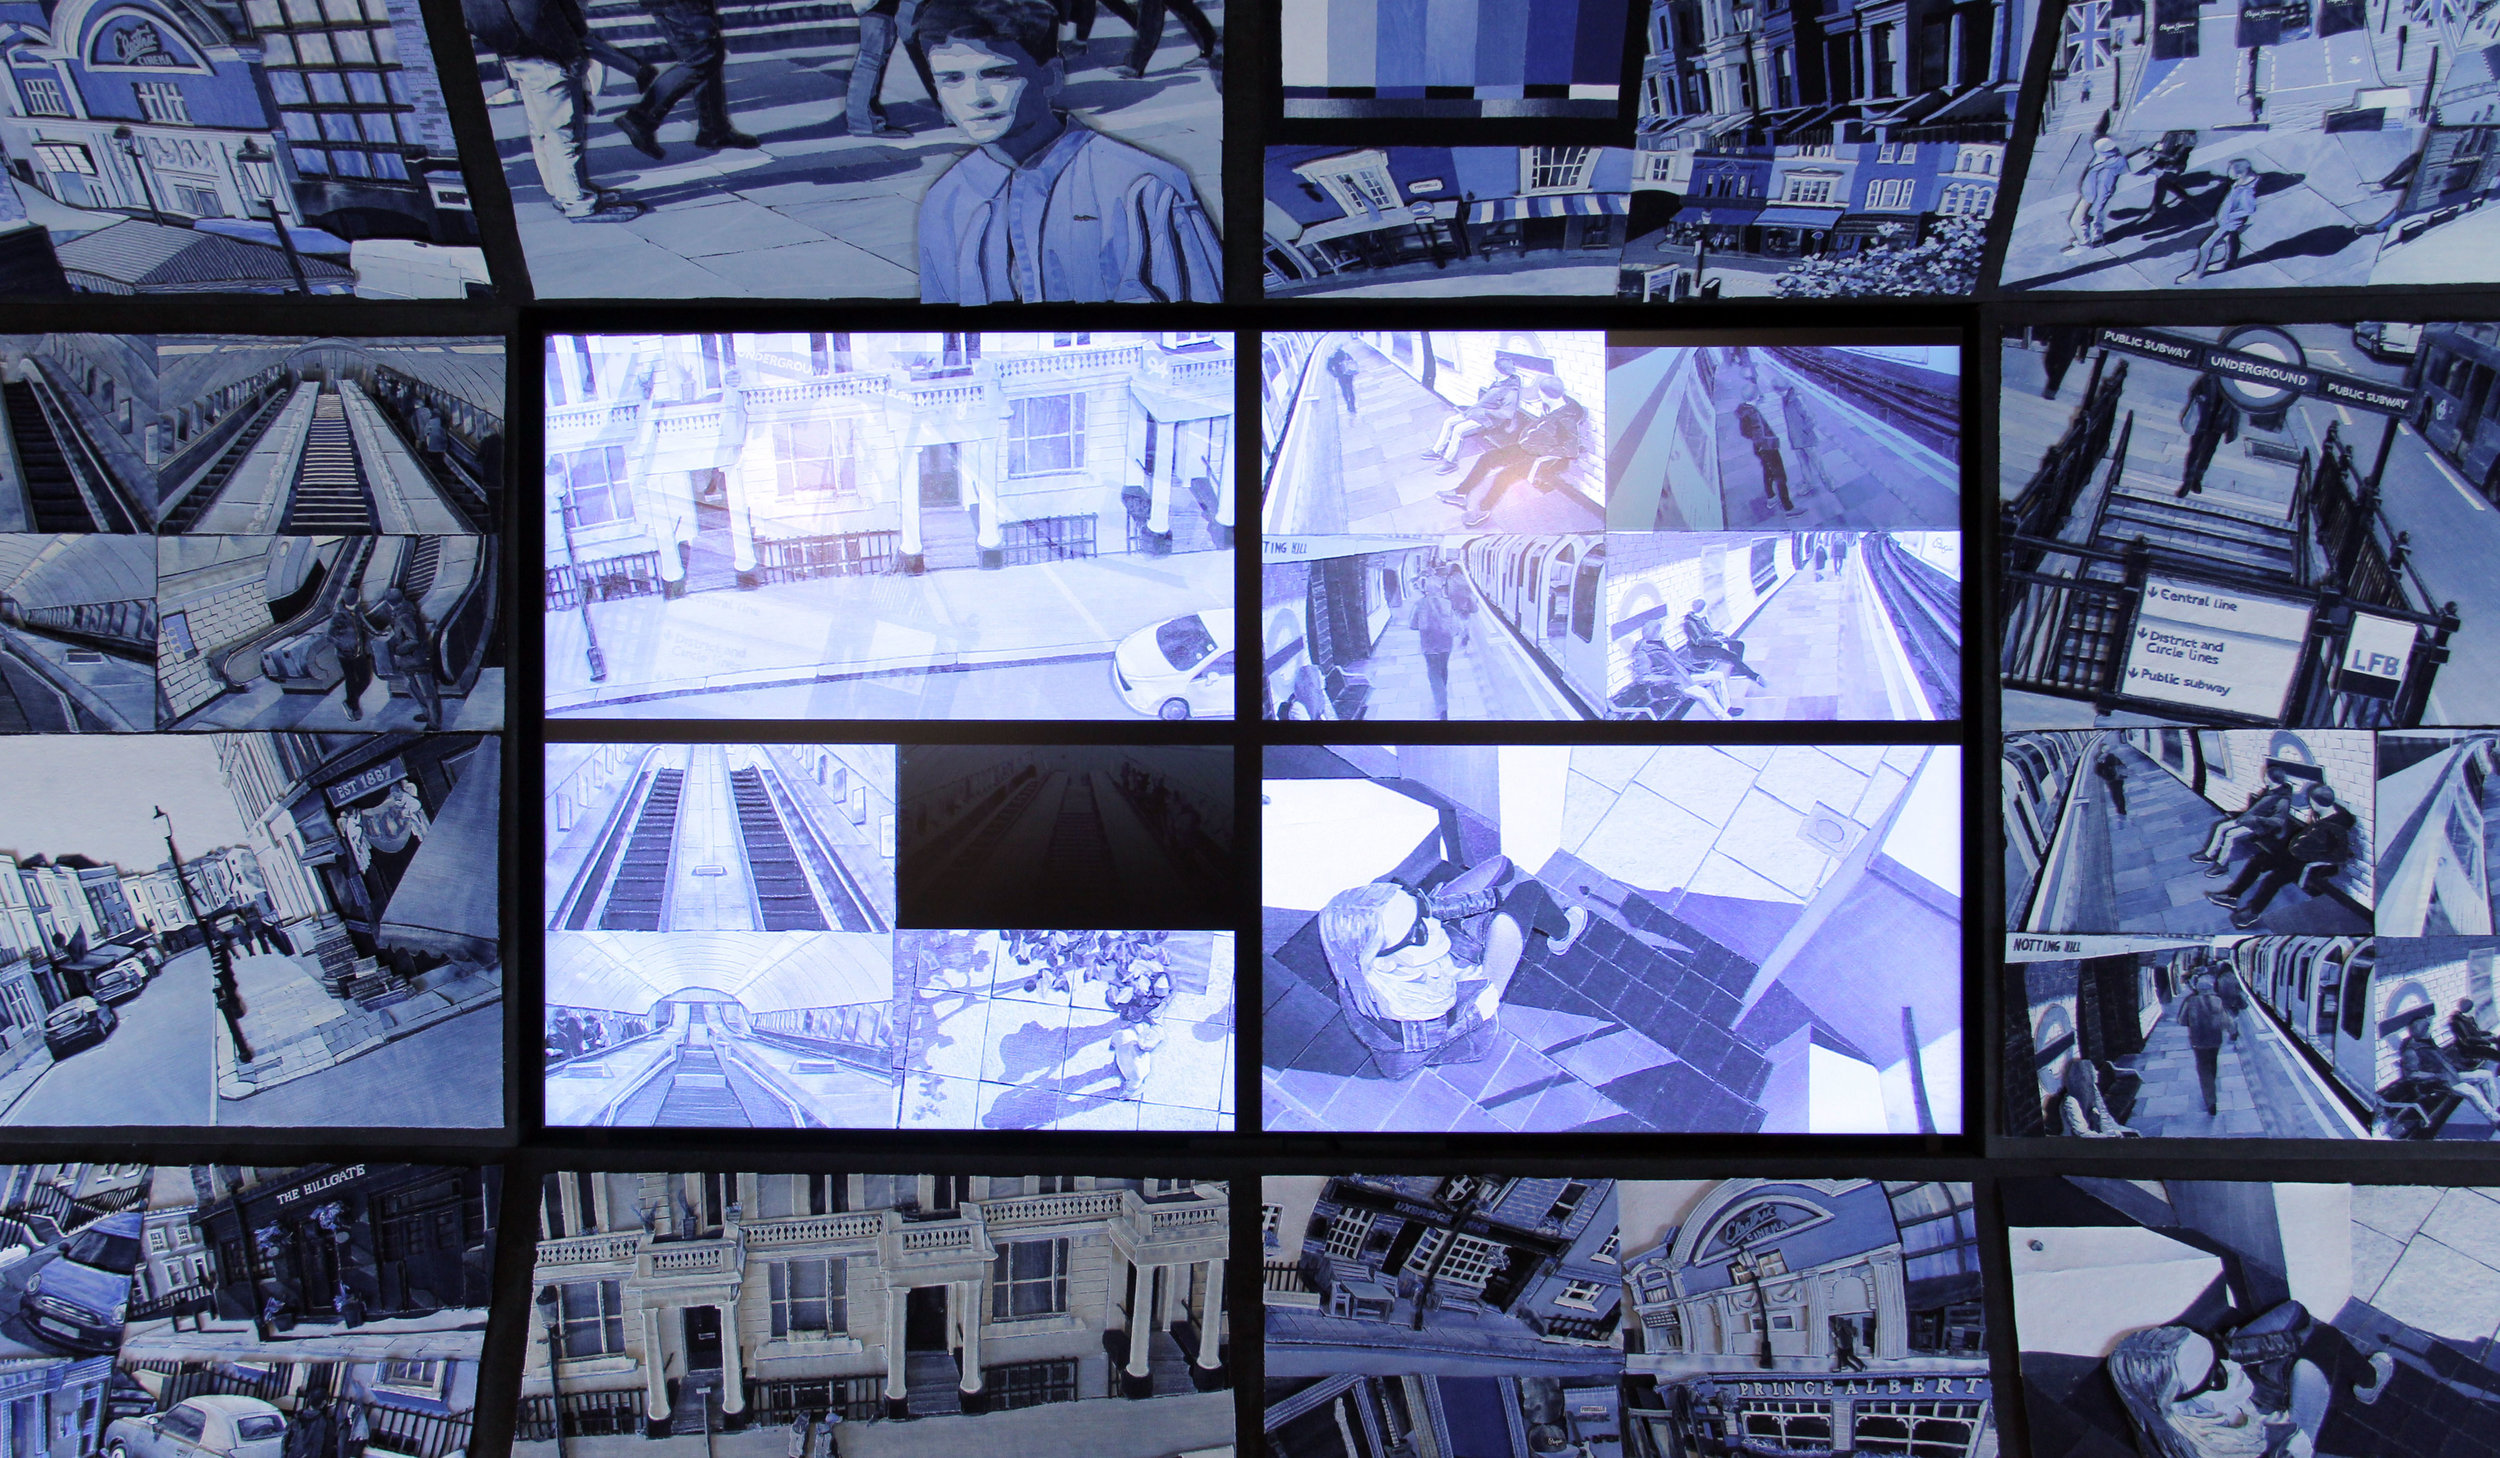 CCTV_control_room_Pepe